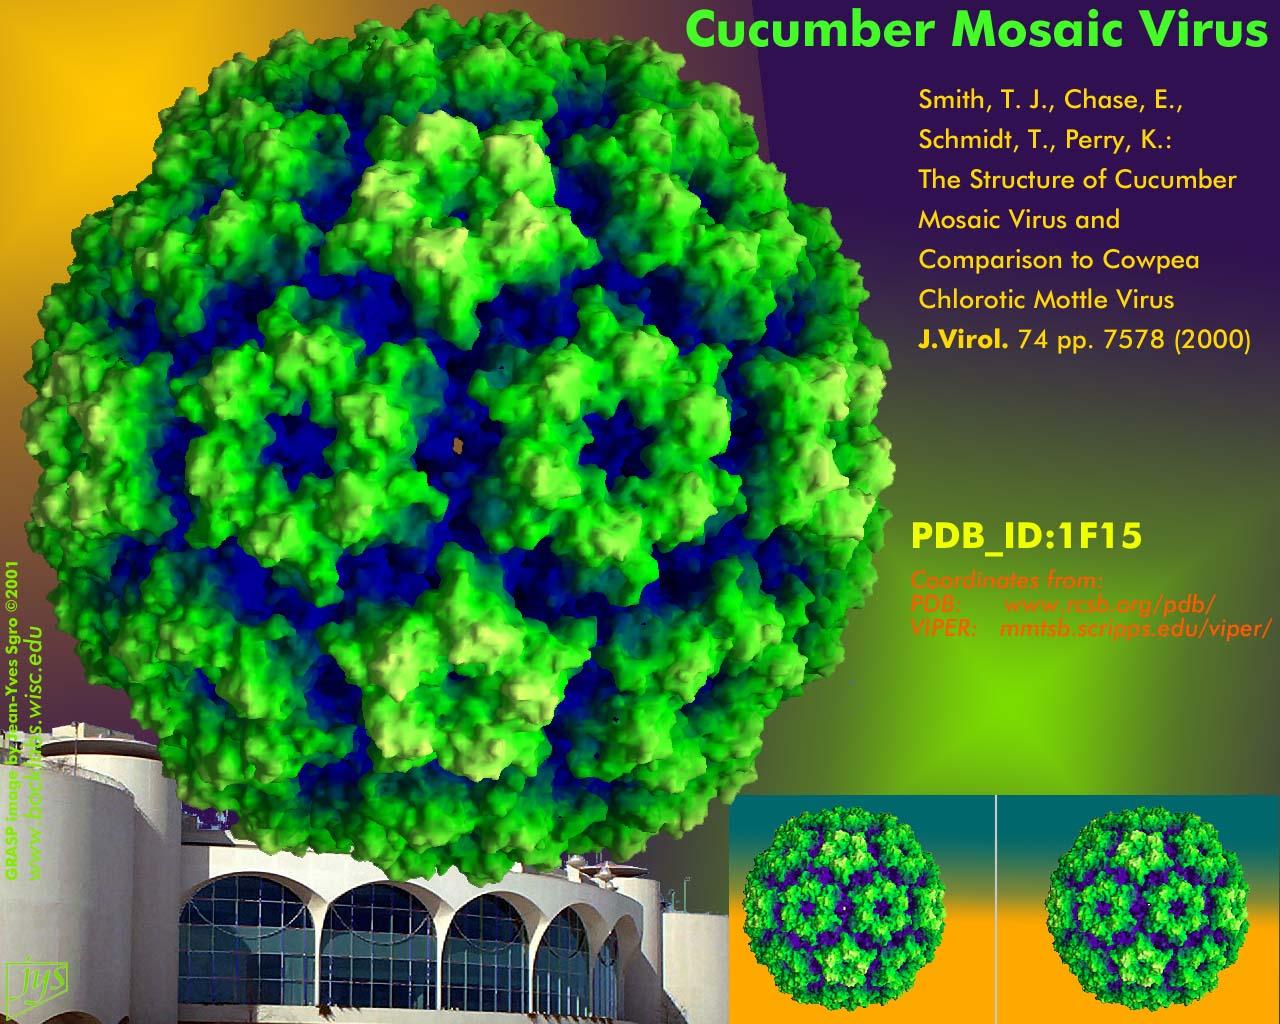 cucumber_mosaic_asv2001.jpg